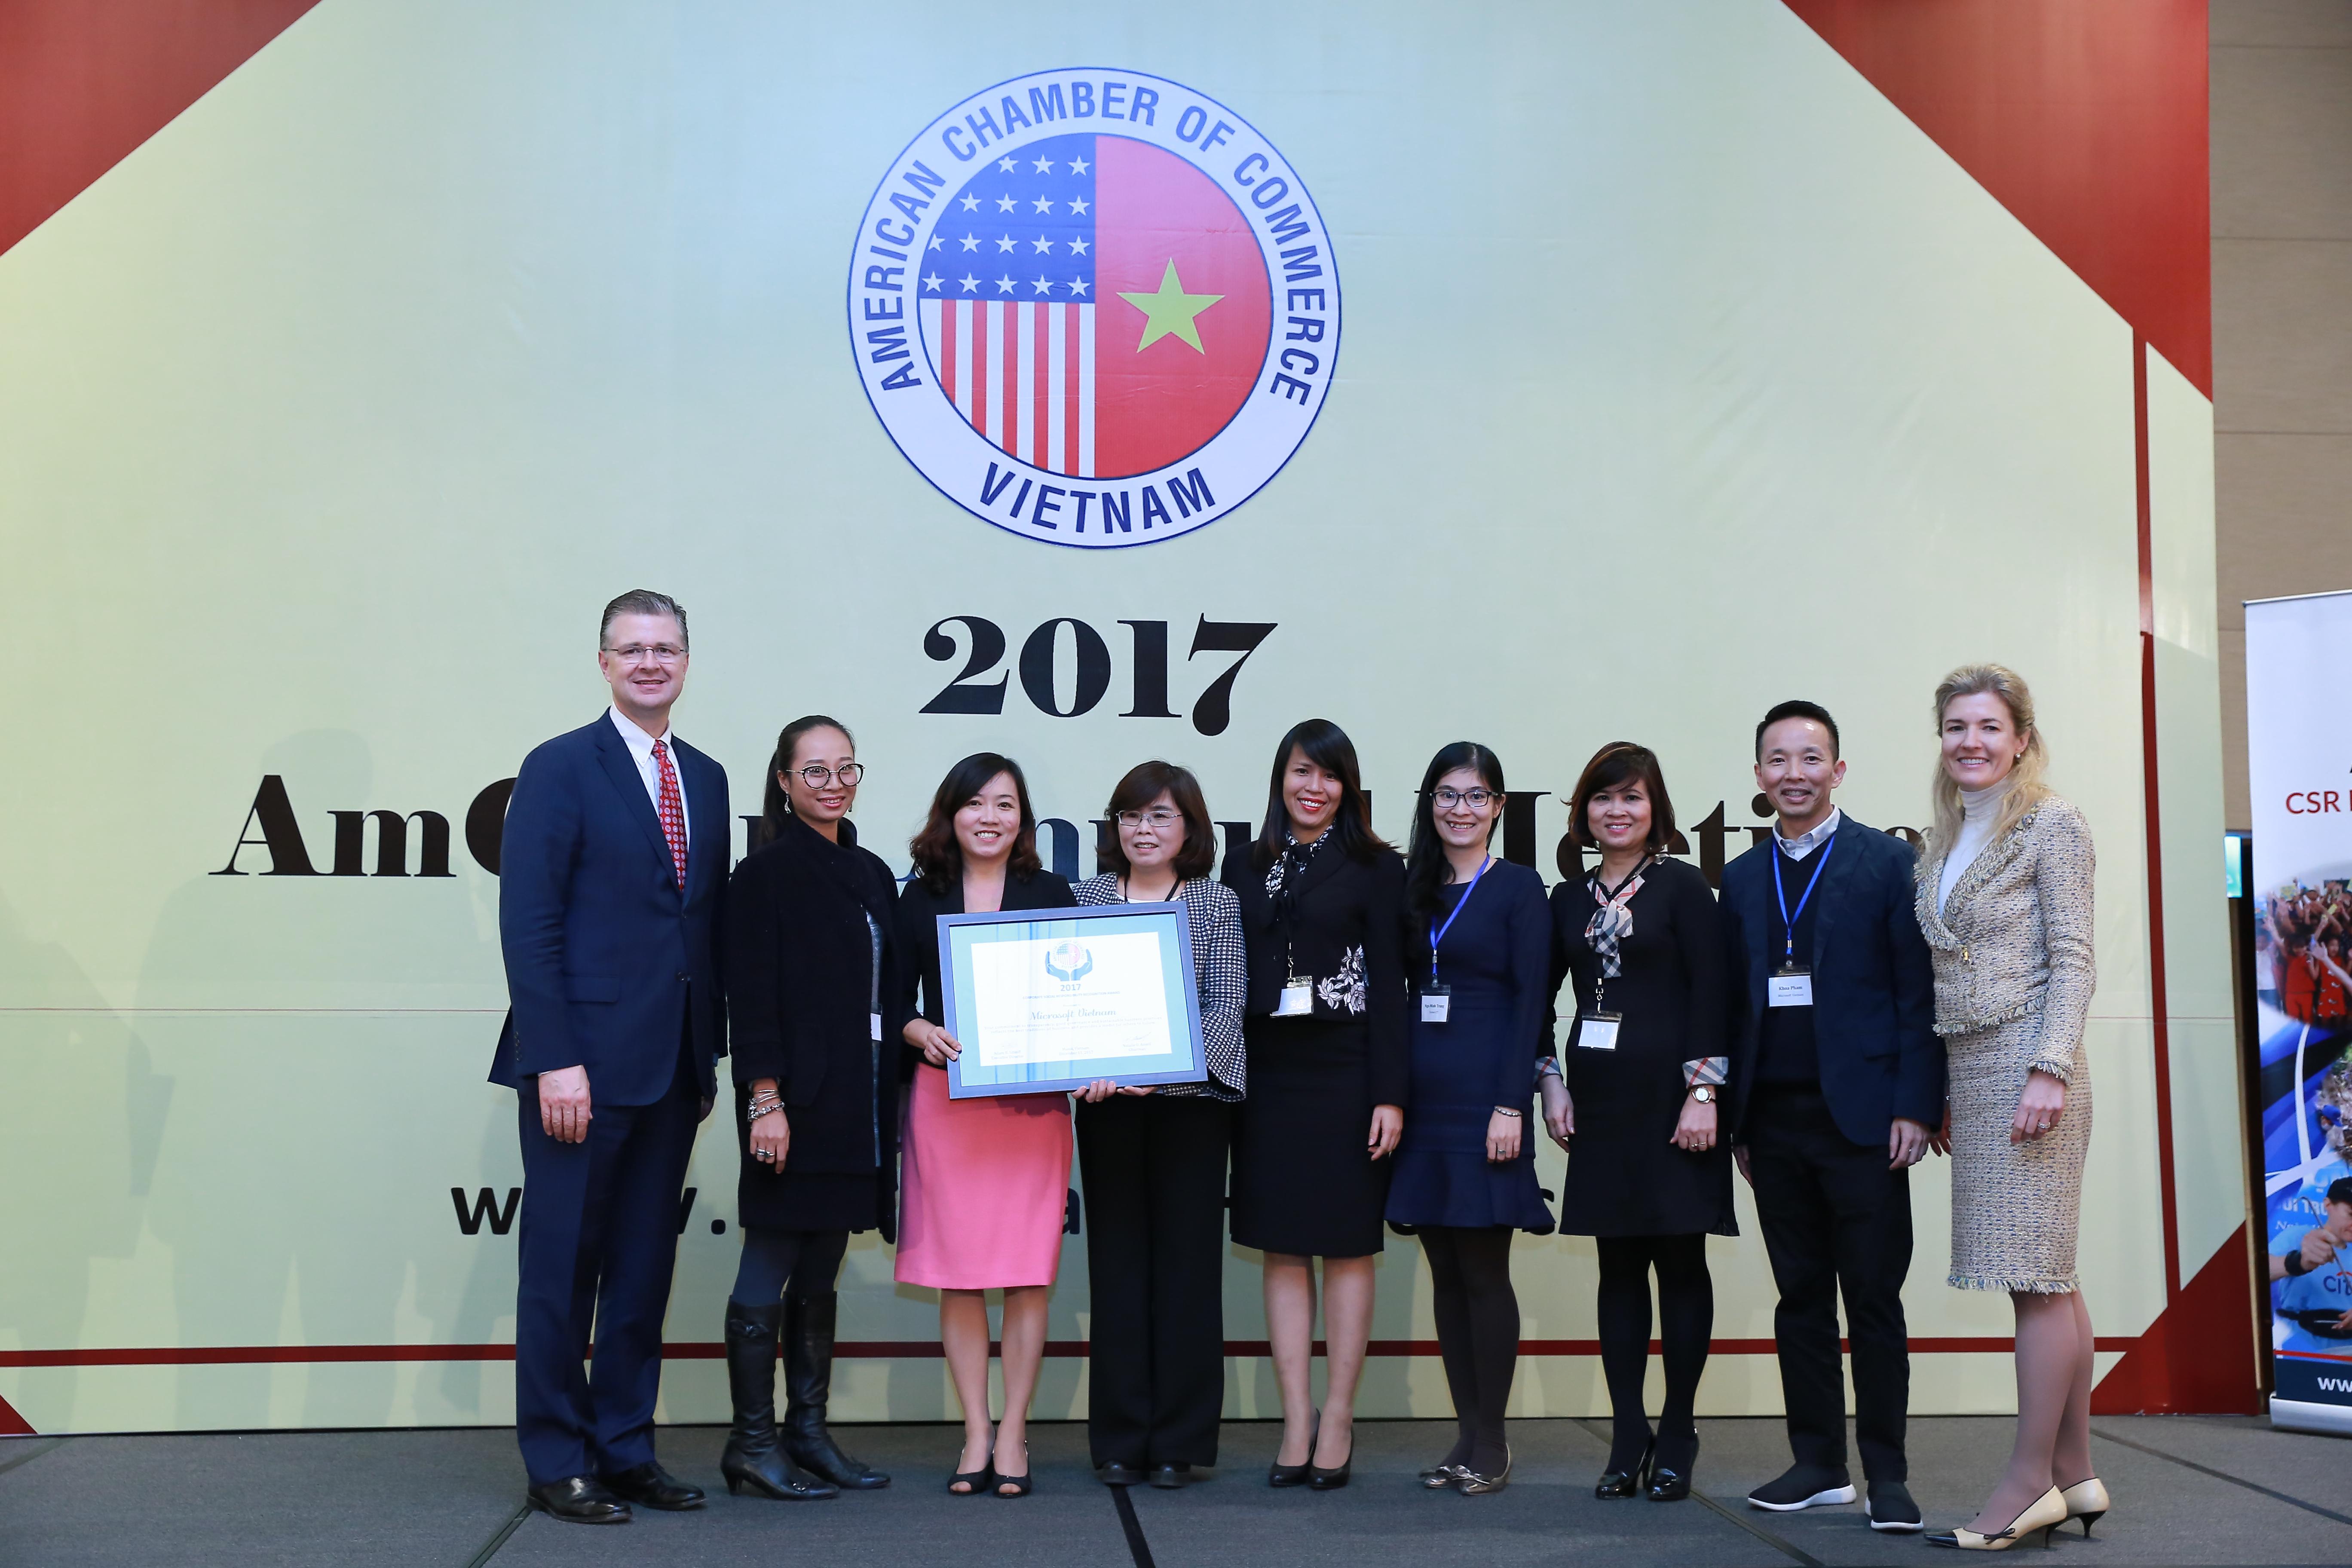 microsoft vietnam receives third csr recognition award